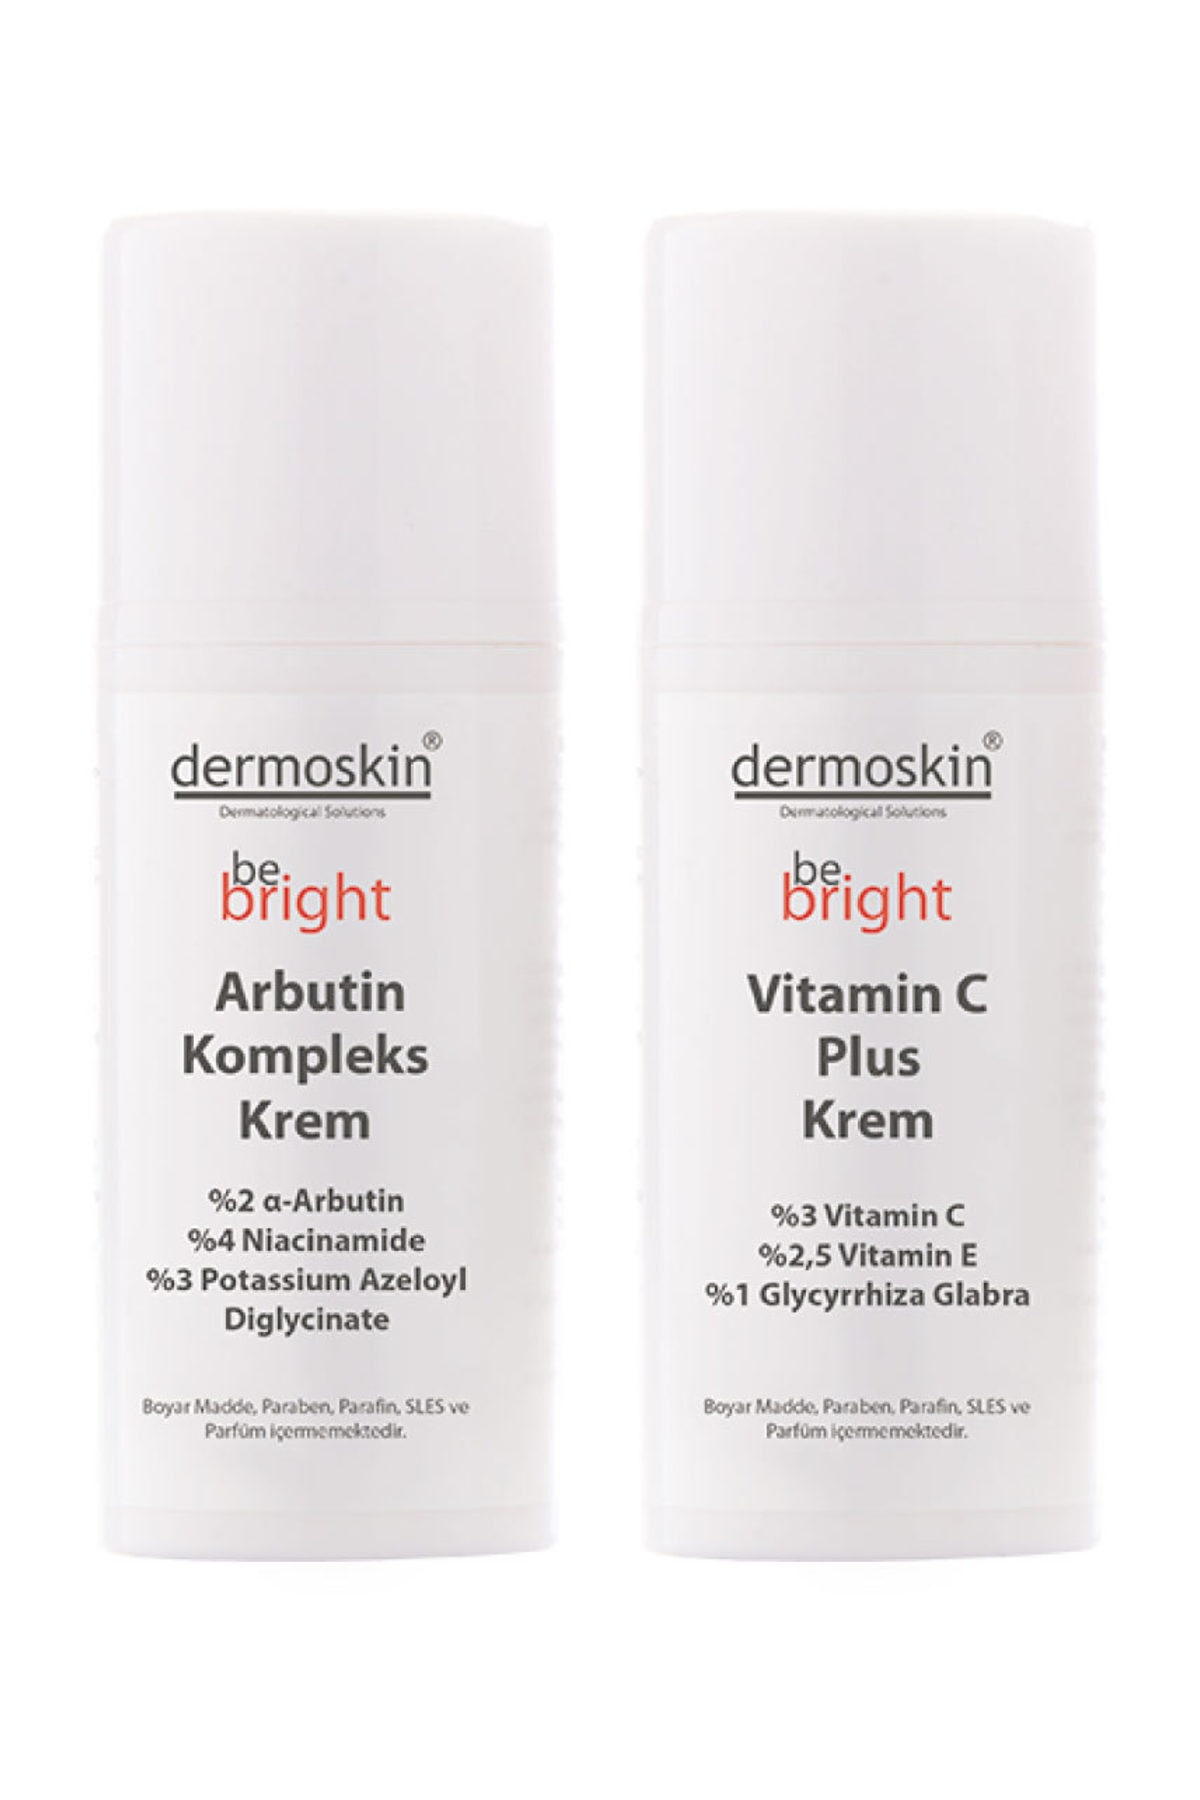 Dermoskin Be Bright Arbutin Kompleks Krem + Be Bright Vitamin C Plus Krem -2'li Avantaj Paket 1